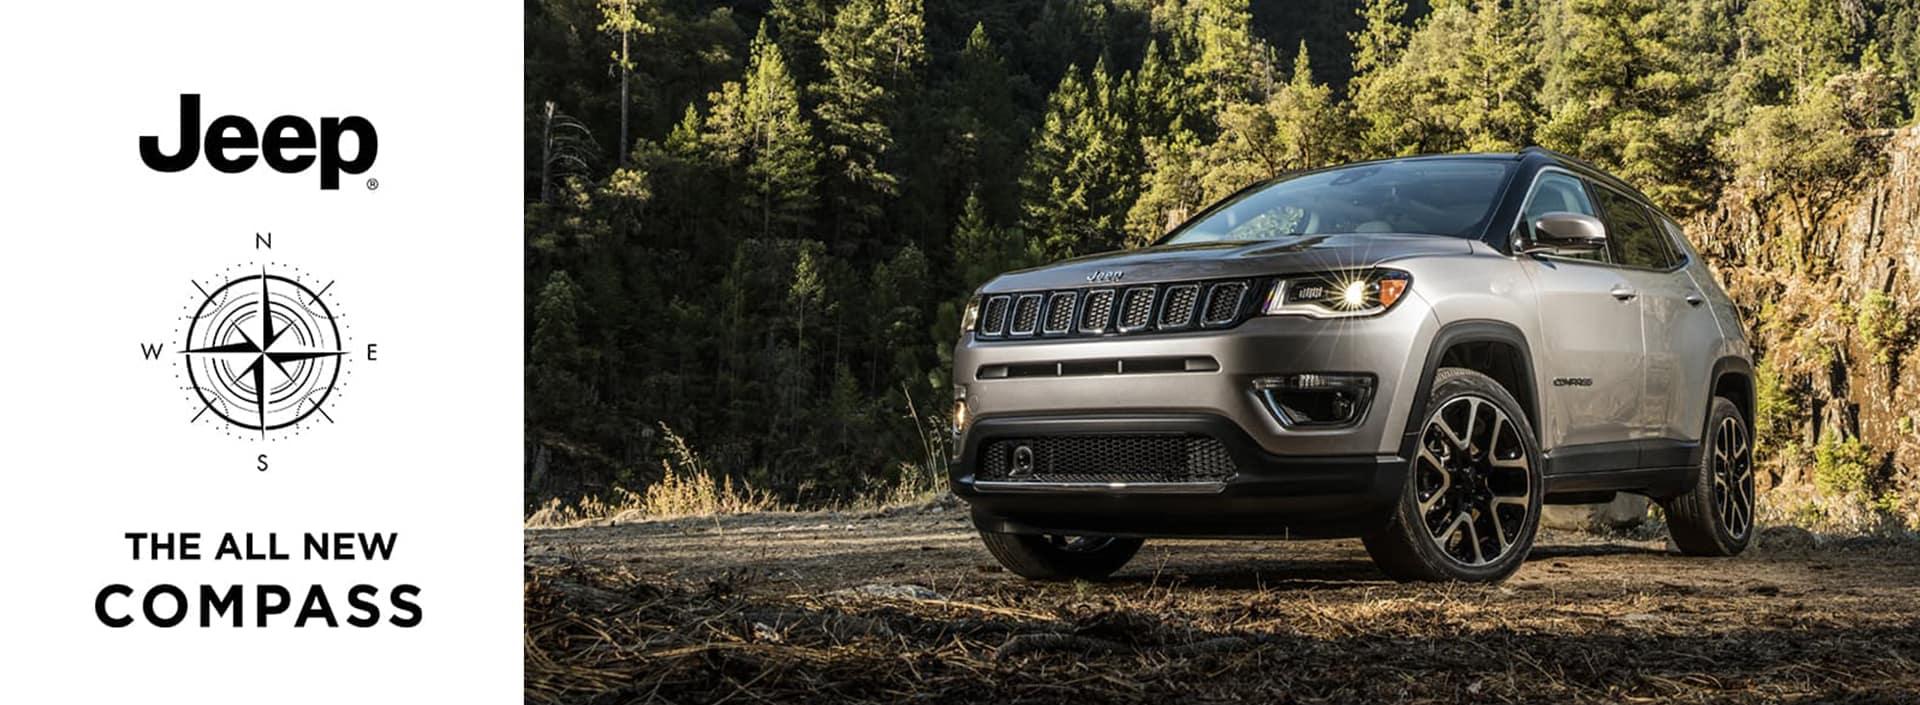 San Antonio Chrysler Dodge Jeep Ram | CDJR Dealer Serving